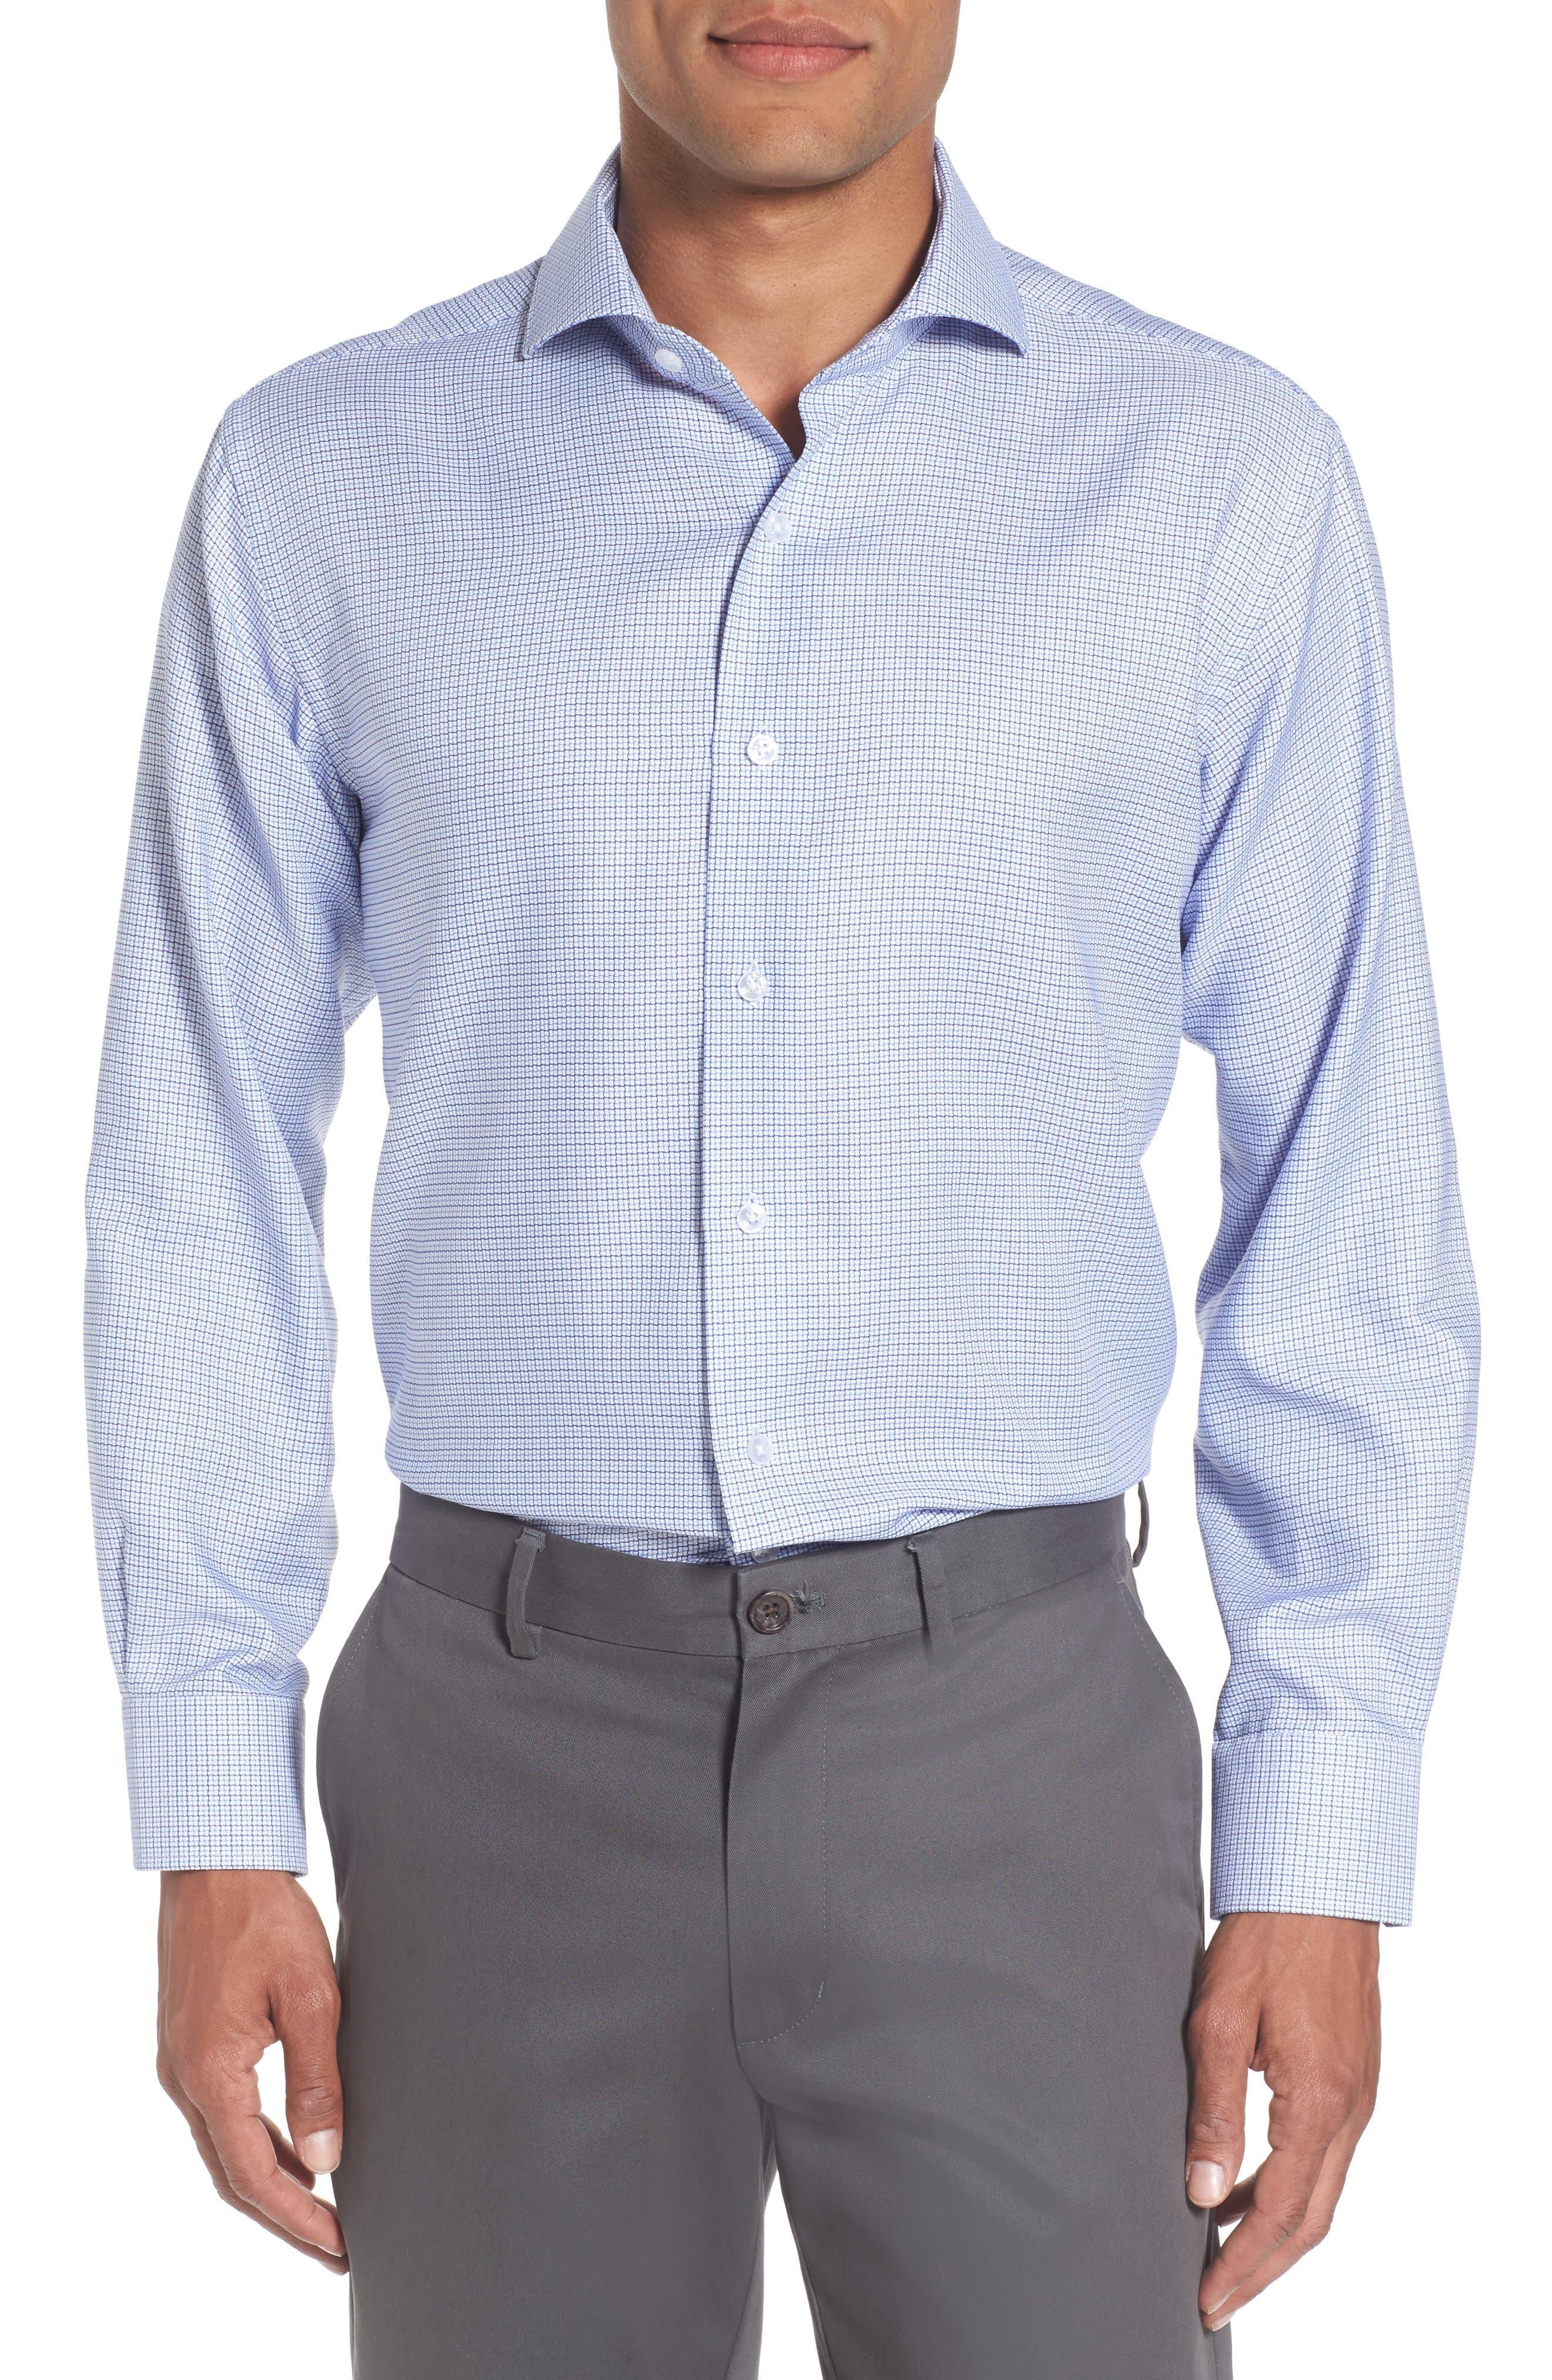 Trim Fit Check Dress Shirt,                         Main,                         color, Light Blue/ Navy